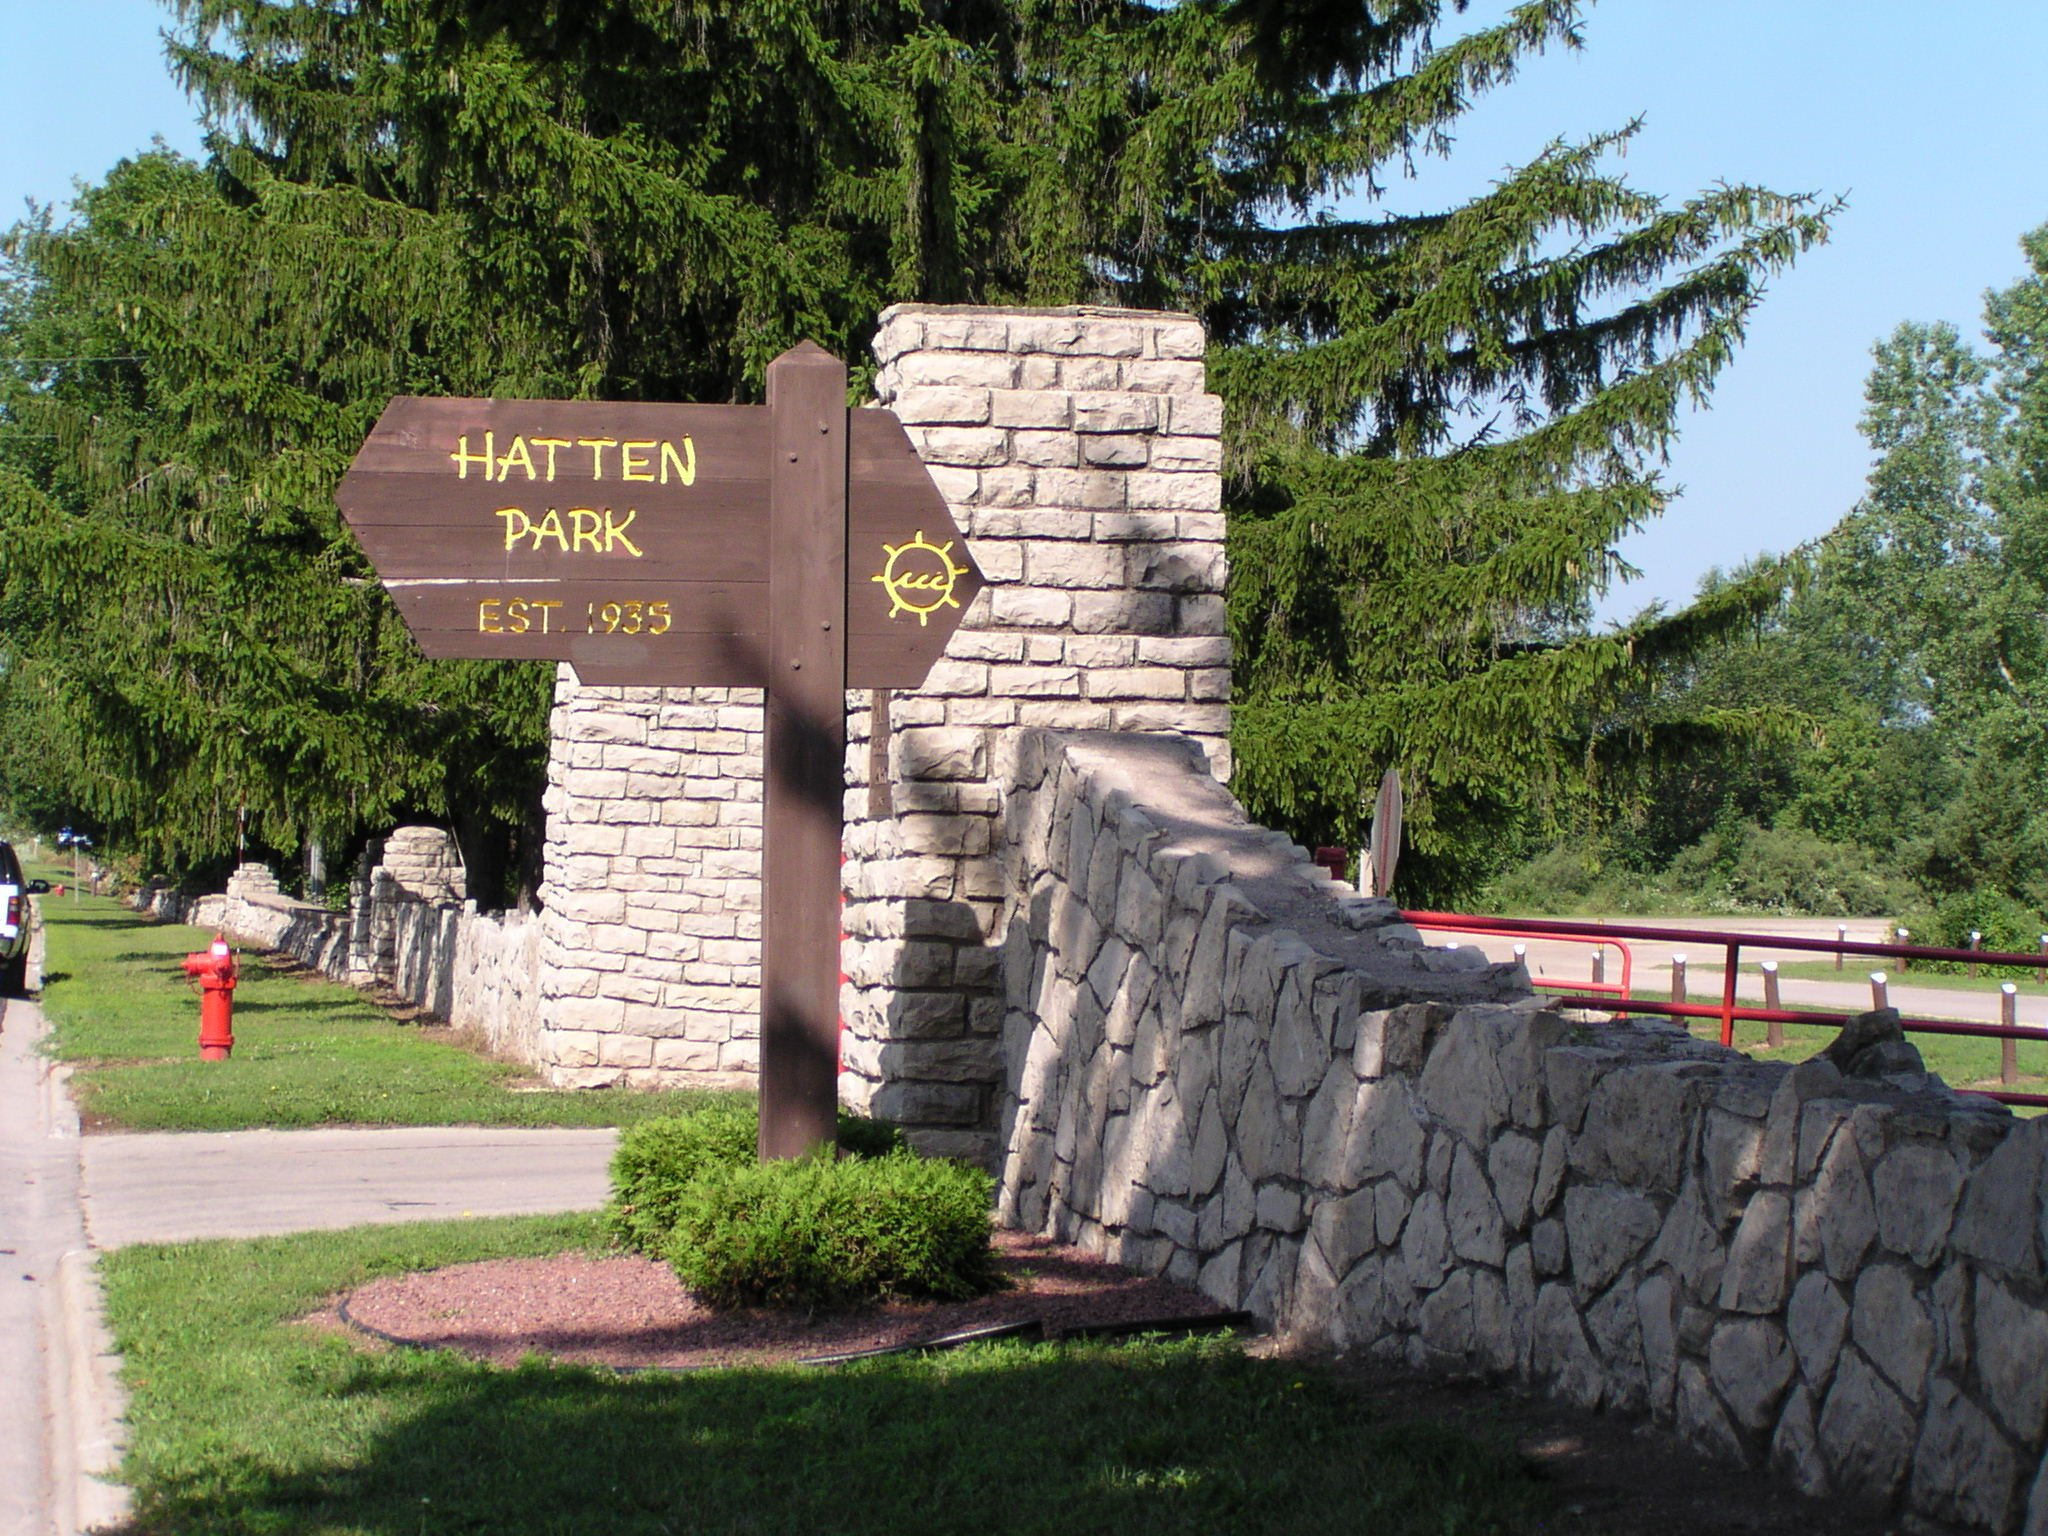 Hatten Park